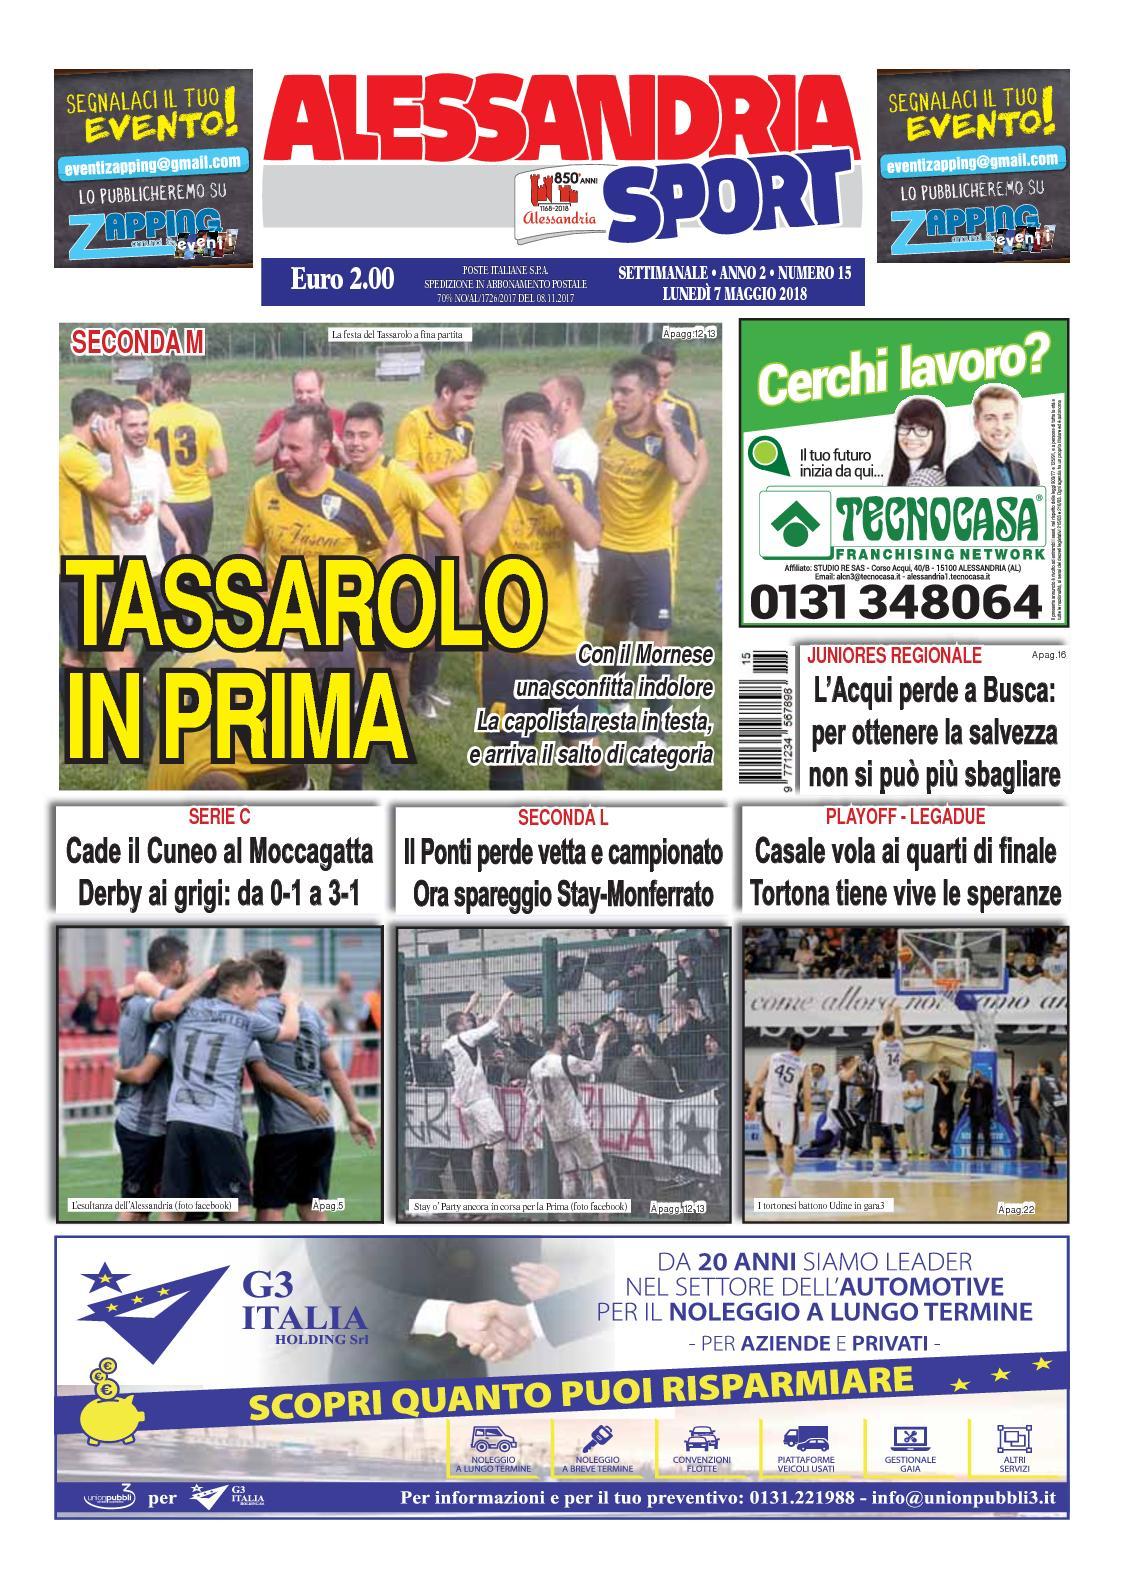 competitive price 95c0e 7fede Calaméo - 2018 Alessandria Sport 15